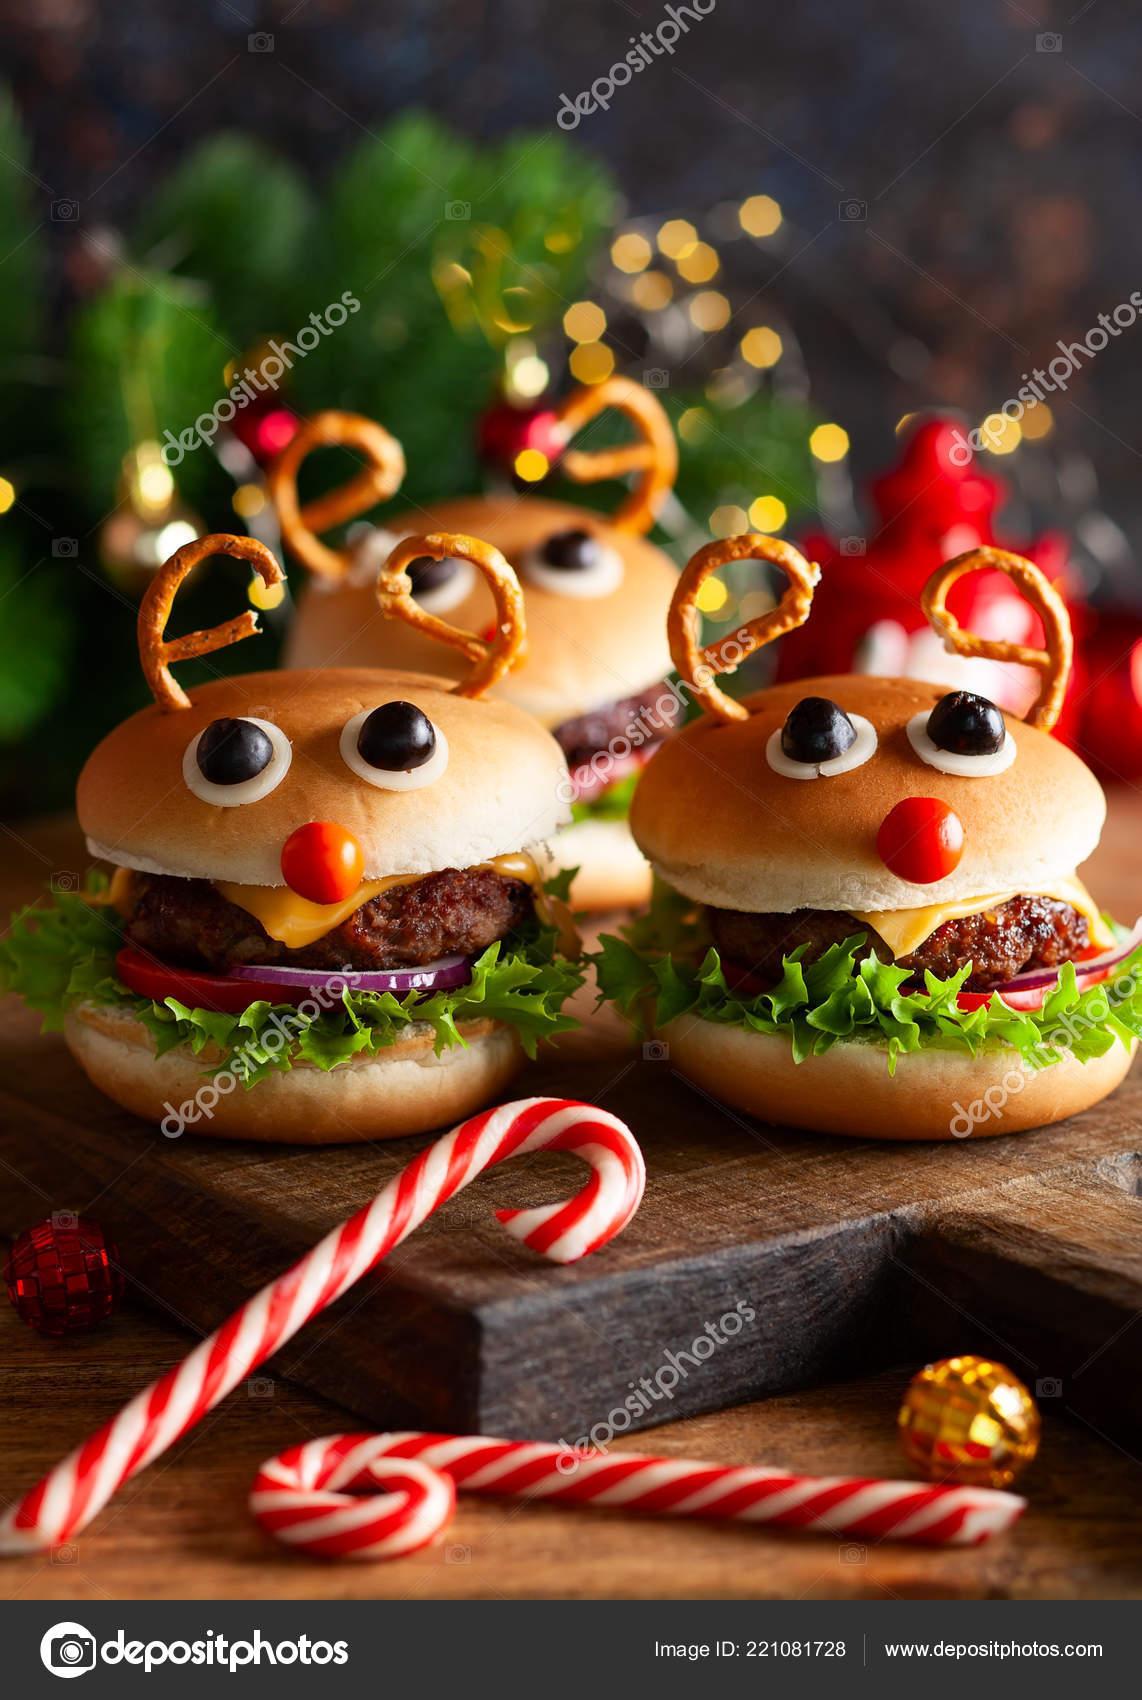 Children Christmas Party Ideas.Christmas Party Idea Kids Christmas Burger Reindeer Sloppy